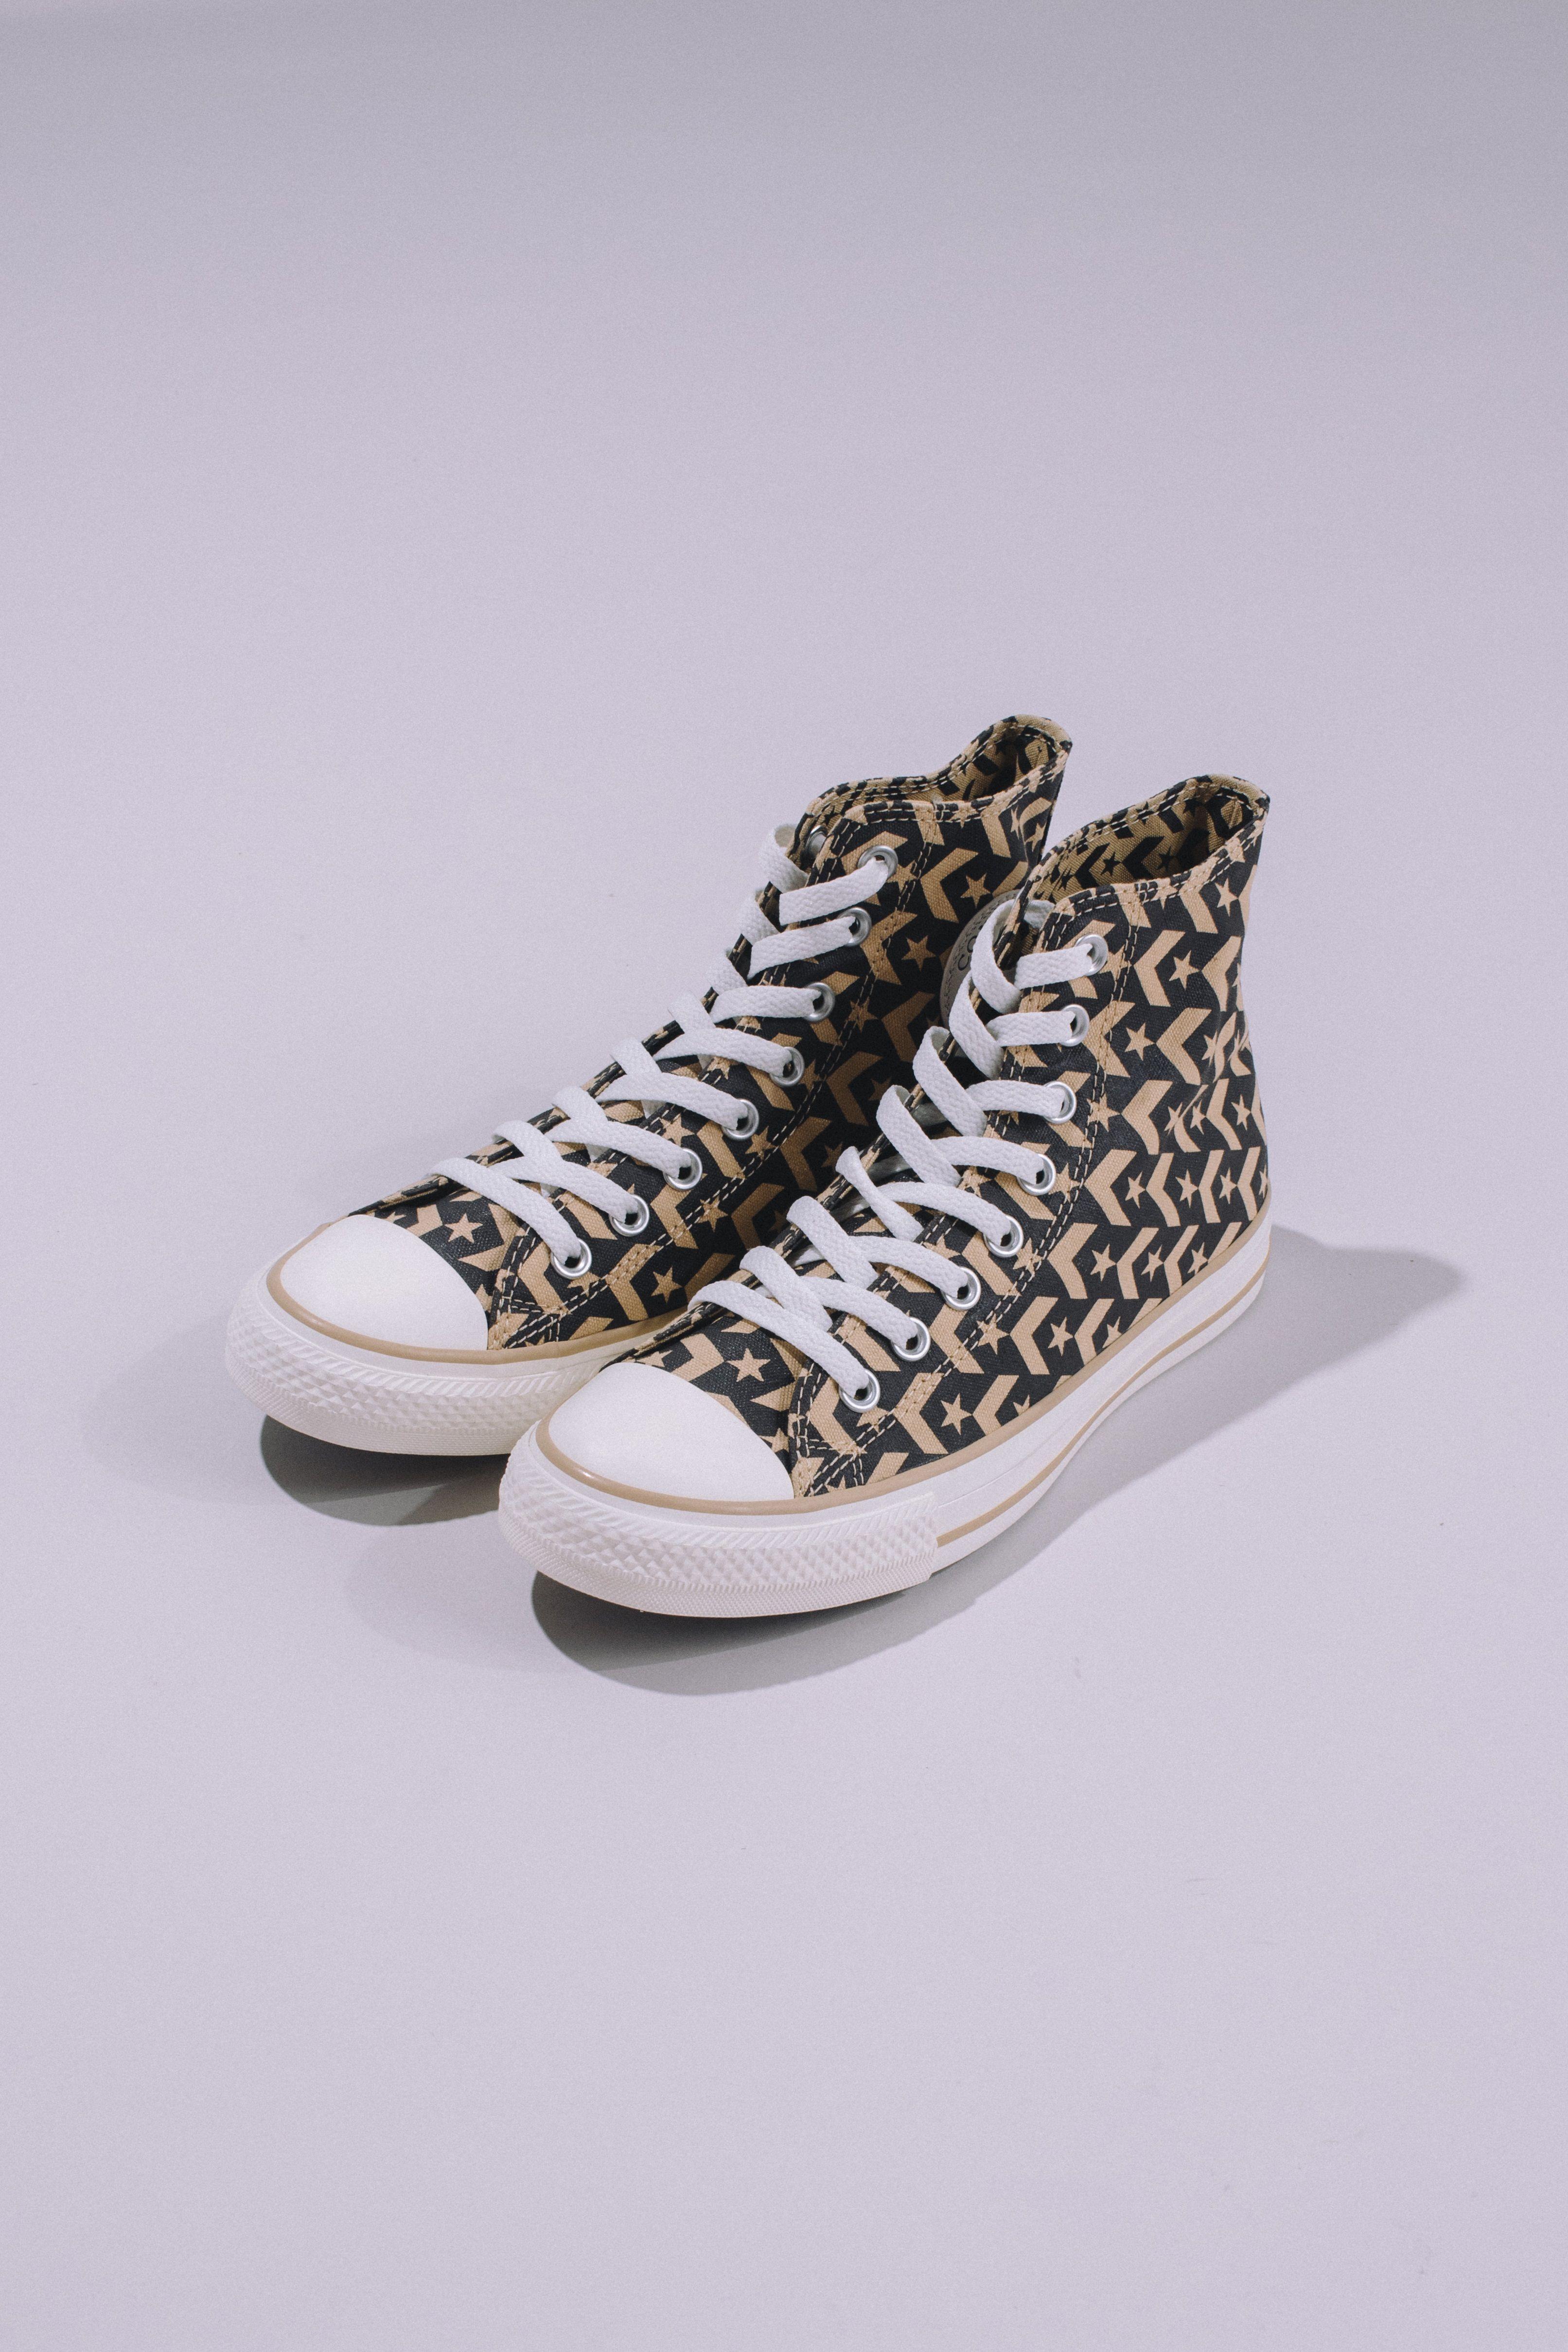 Converse Exclusive for Bershka -  converseexclusiveforbershka  converse   bershka  sneakers  brand   2b06de846